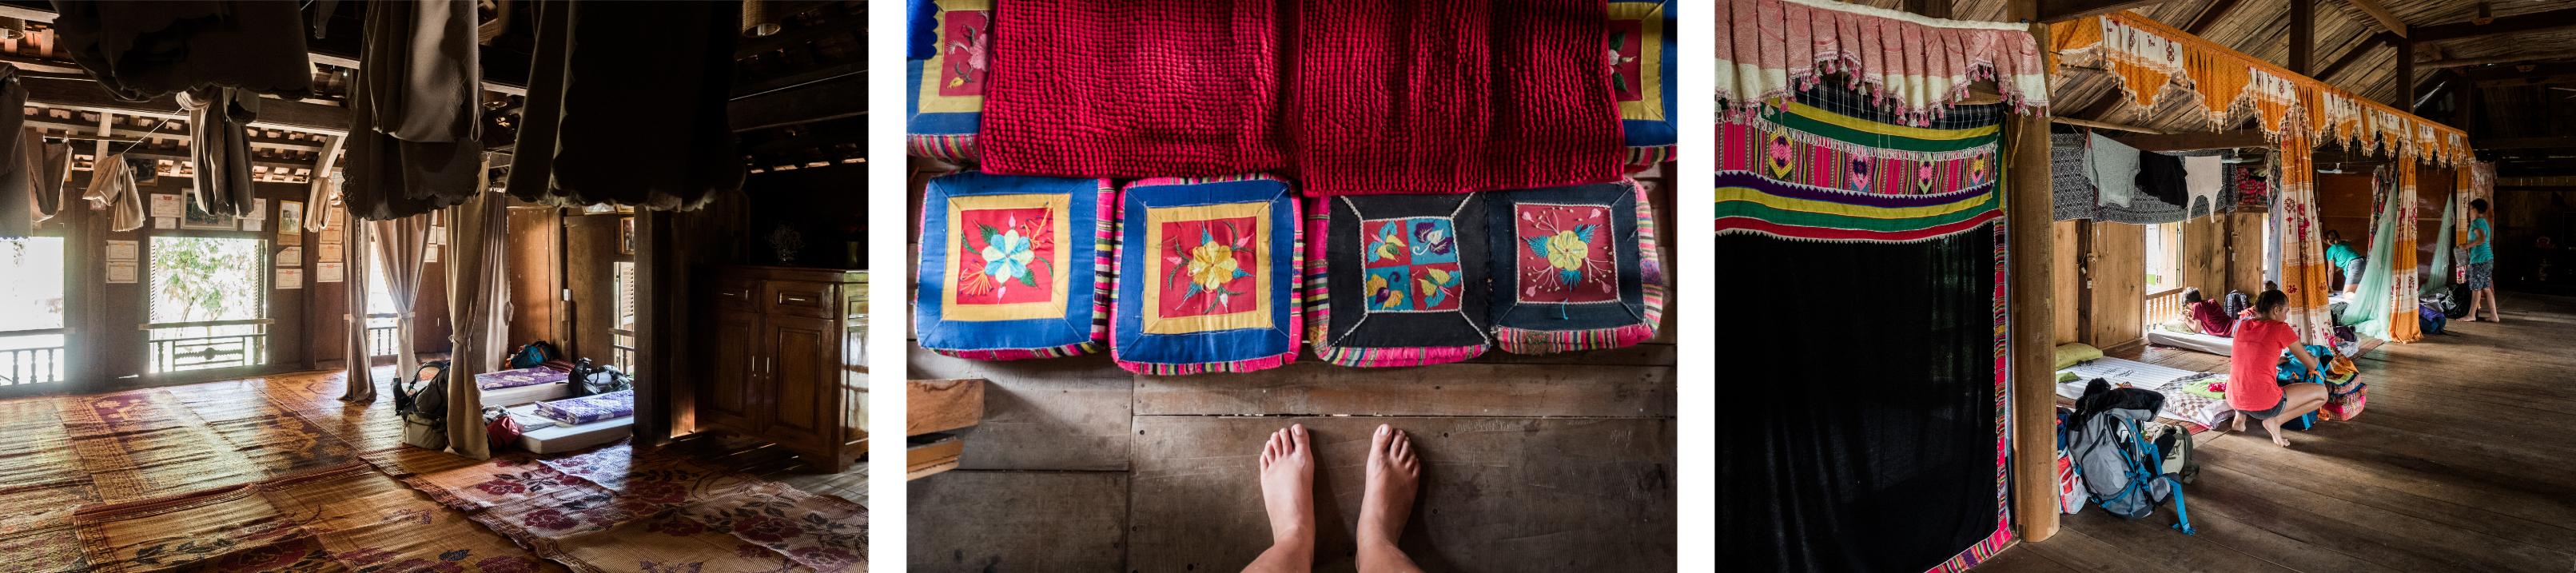 dormir chez l'habitant au vietnam - asie - ethnies minoritaires - montagnes du nord